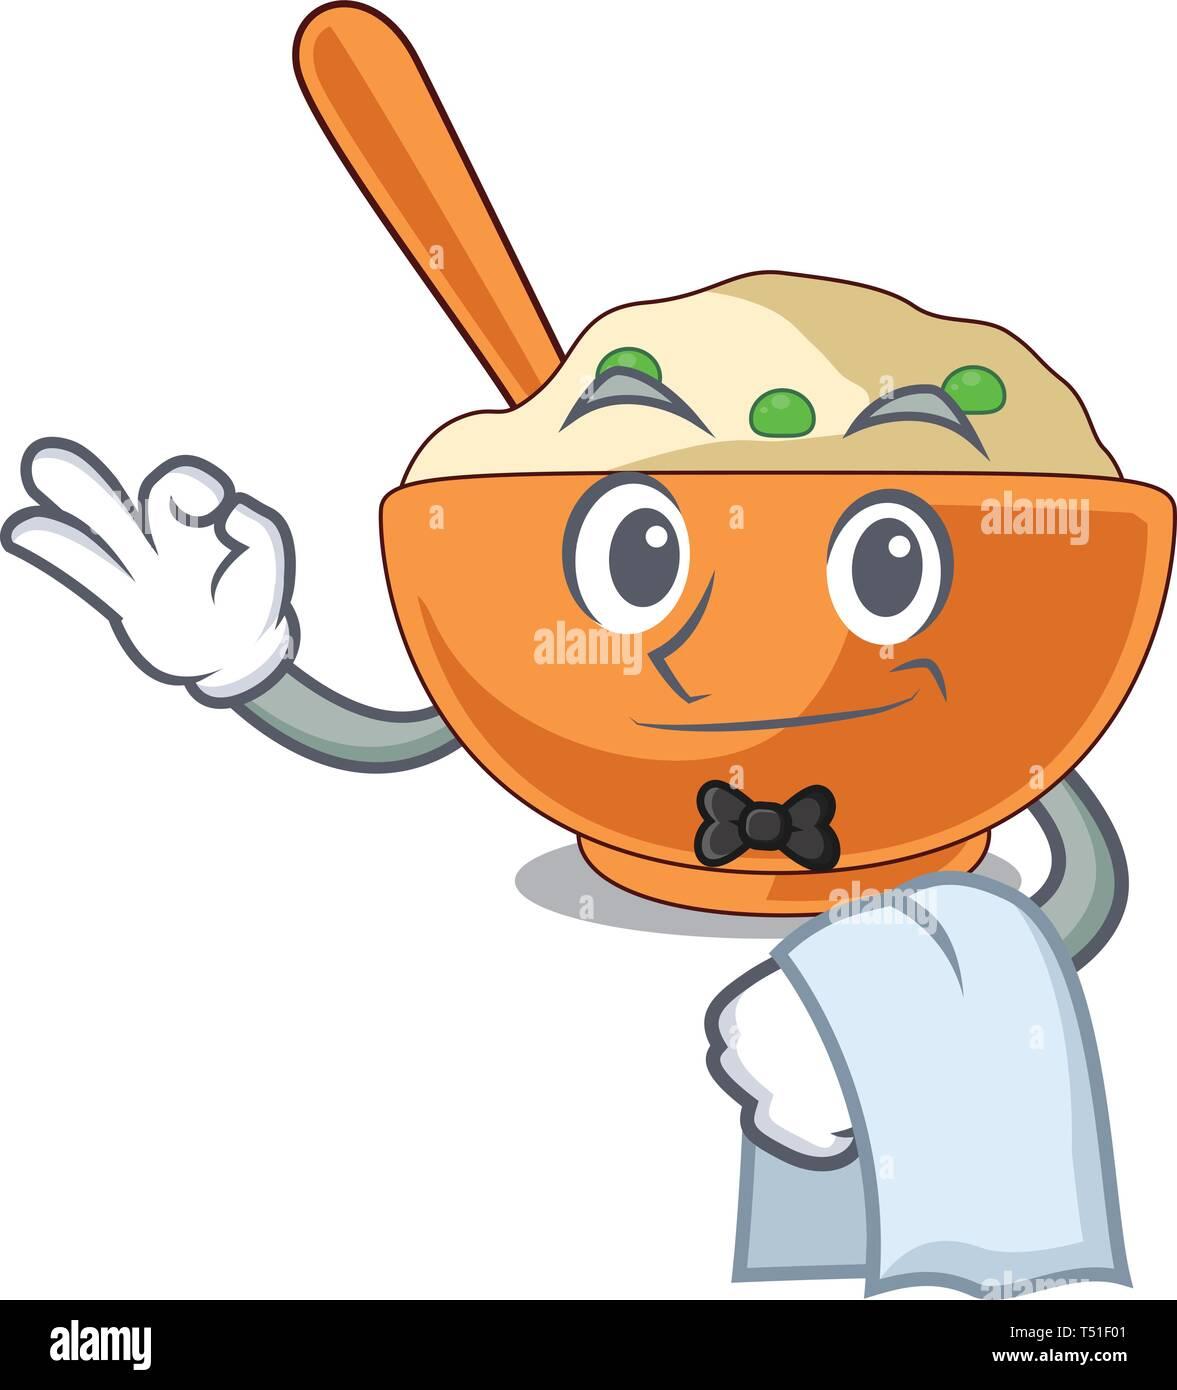 Waiter mashed potato in the shape mascot - Stock Vector